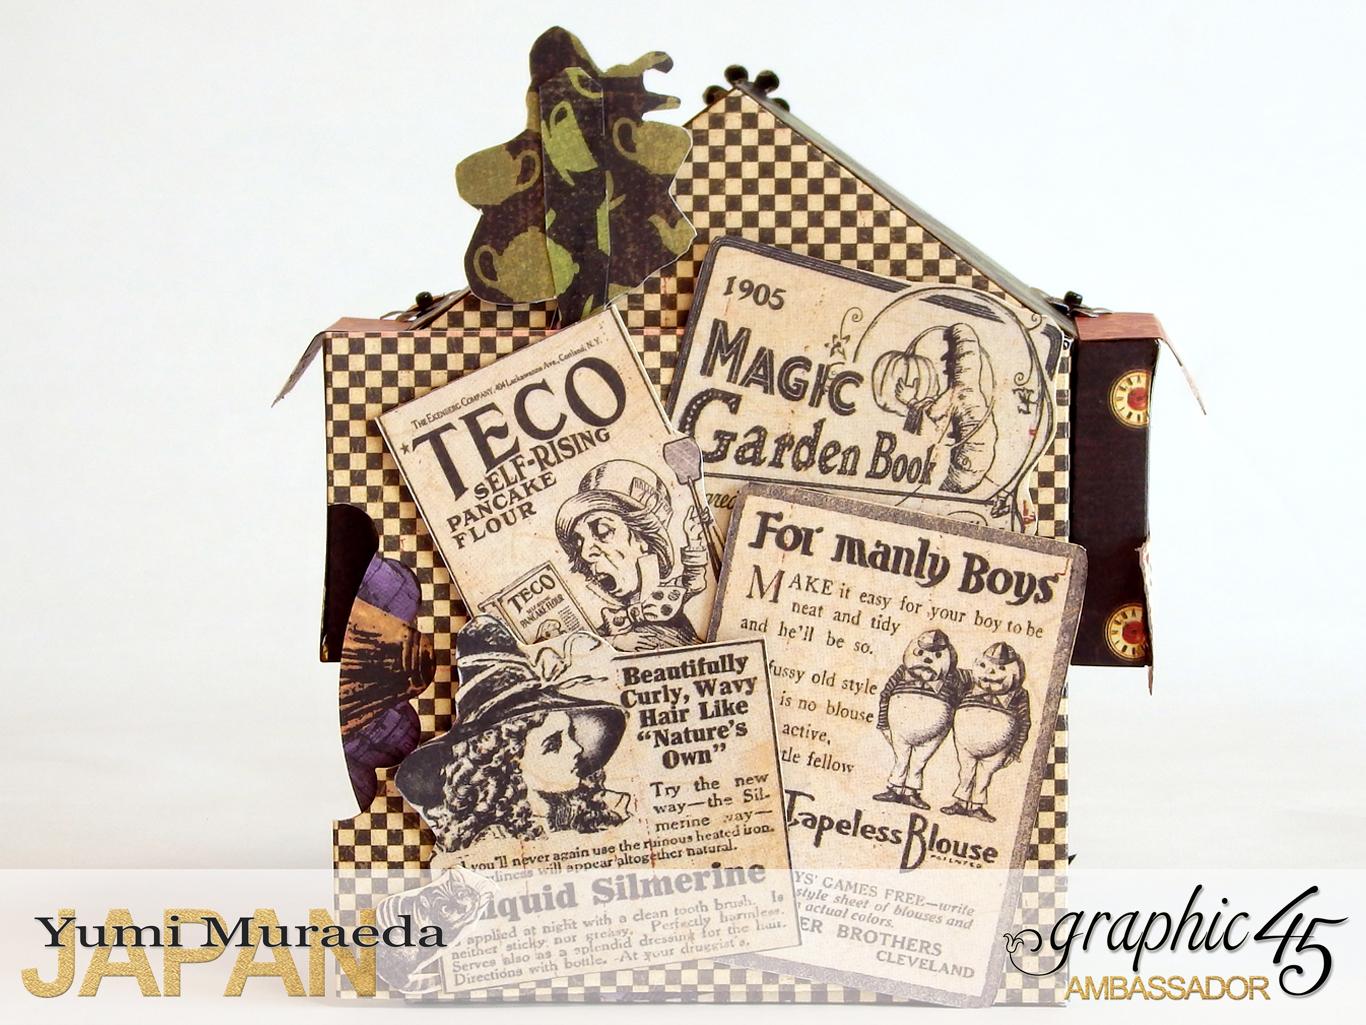 3 Alices Odd Tea HouseHalloween Wonderlandby Yumi MuraedaProduct by Graphic 45